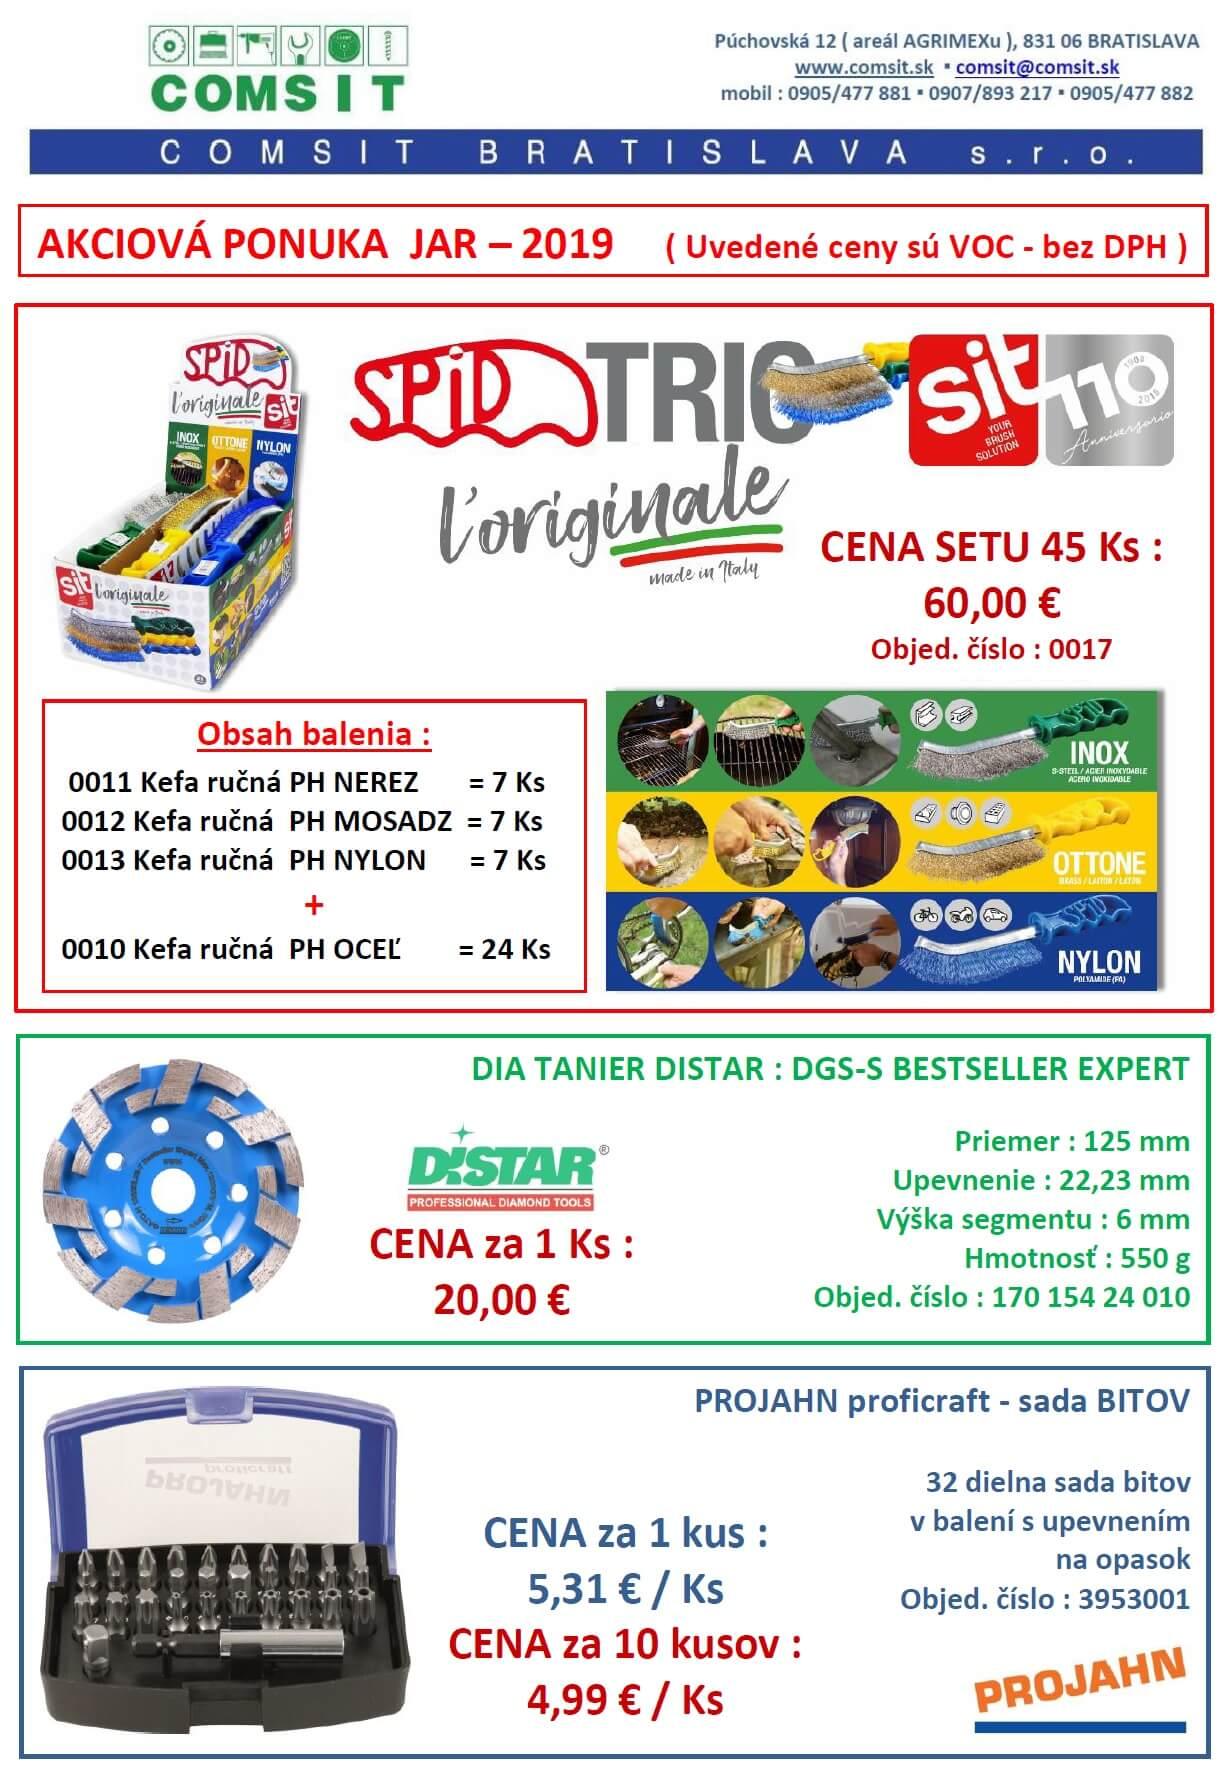 COMSIT BRATISLAVA s.r.o. - AKCIA  JAR - 2019